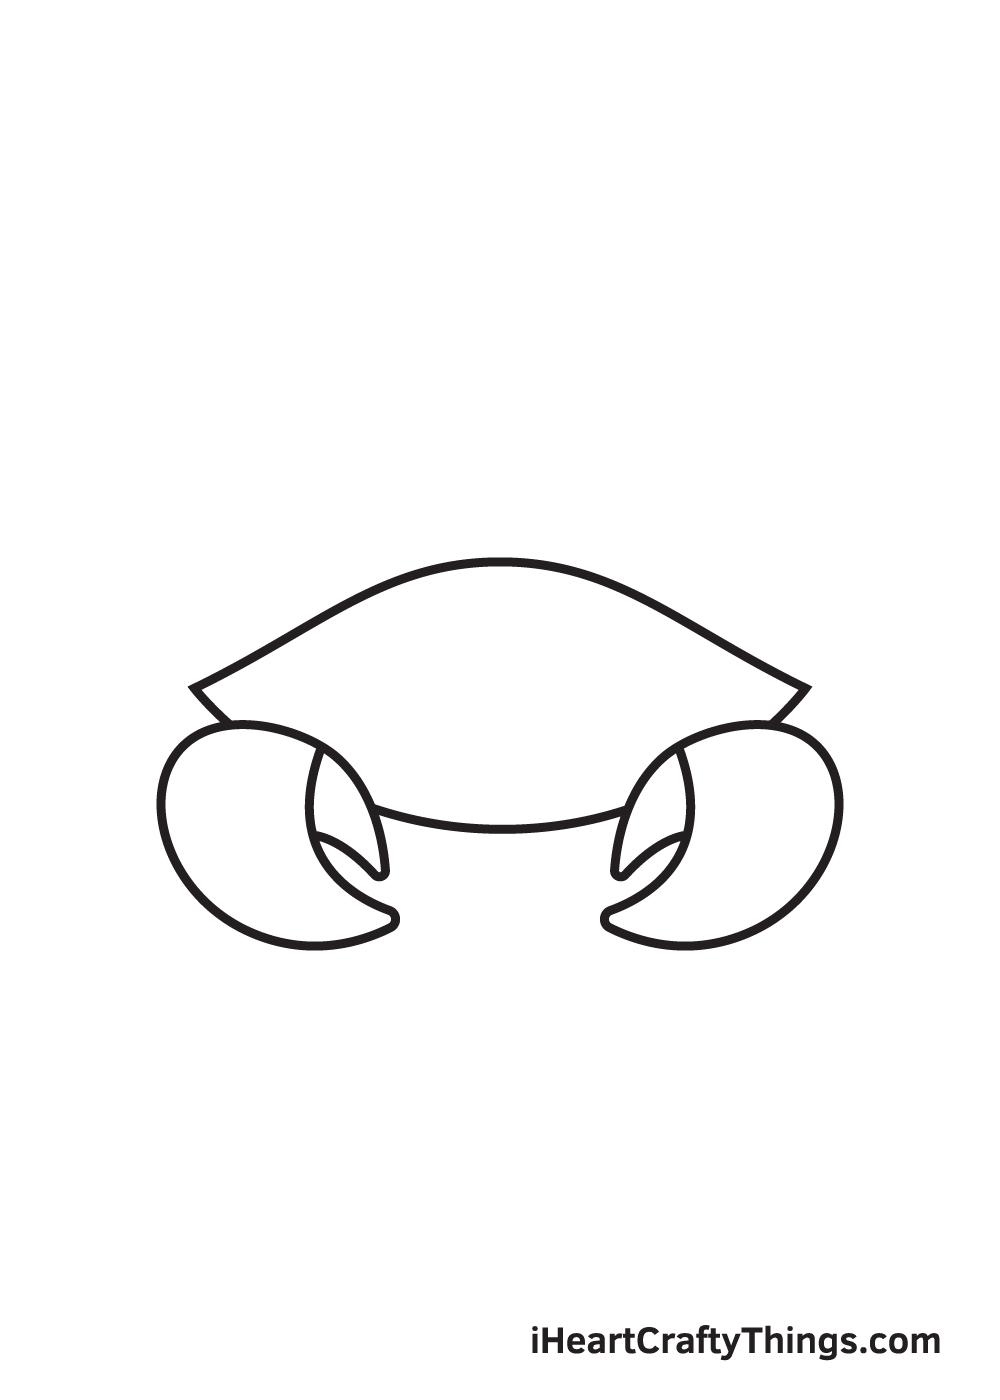 Crab Drawing – Step 3